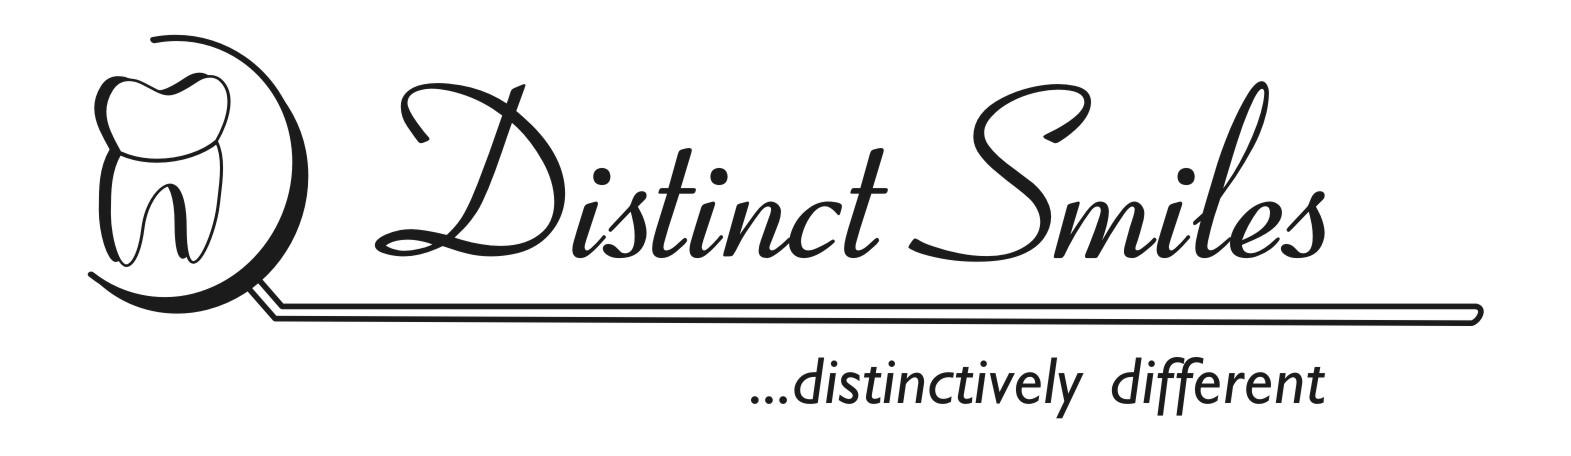 Distinct Smiles